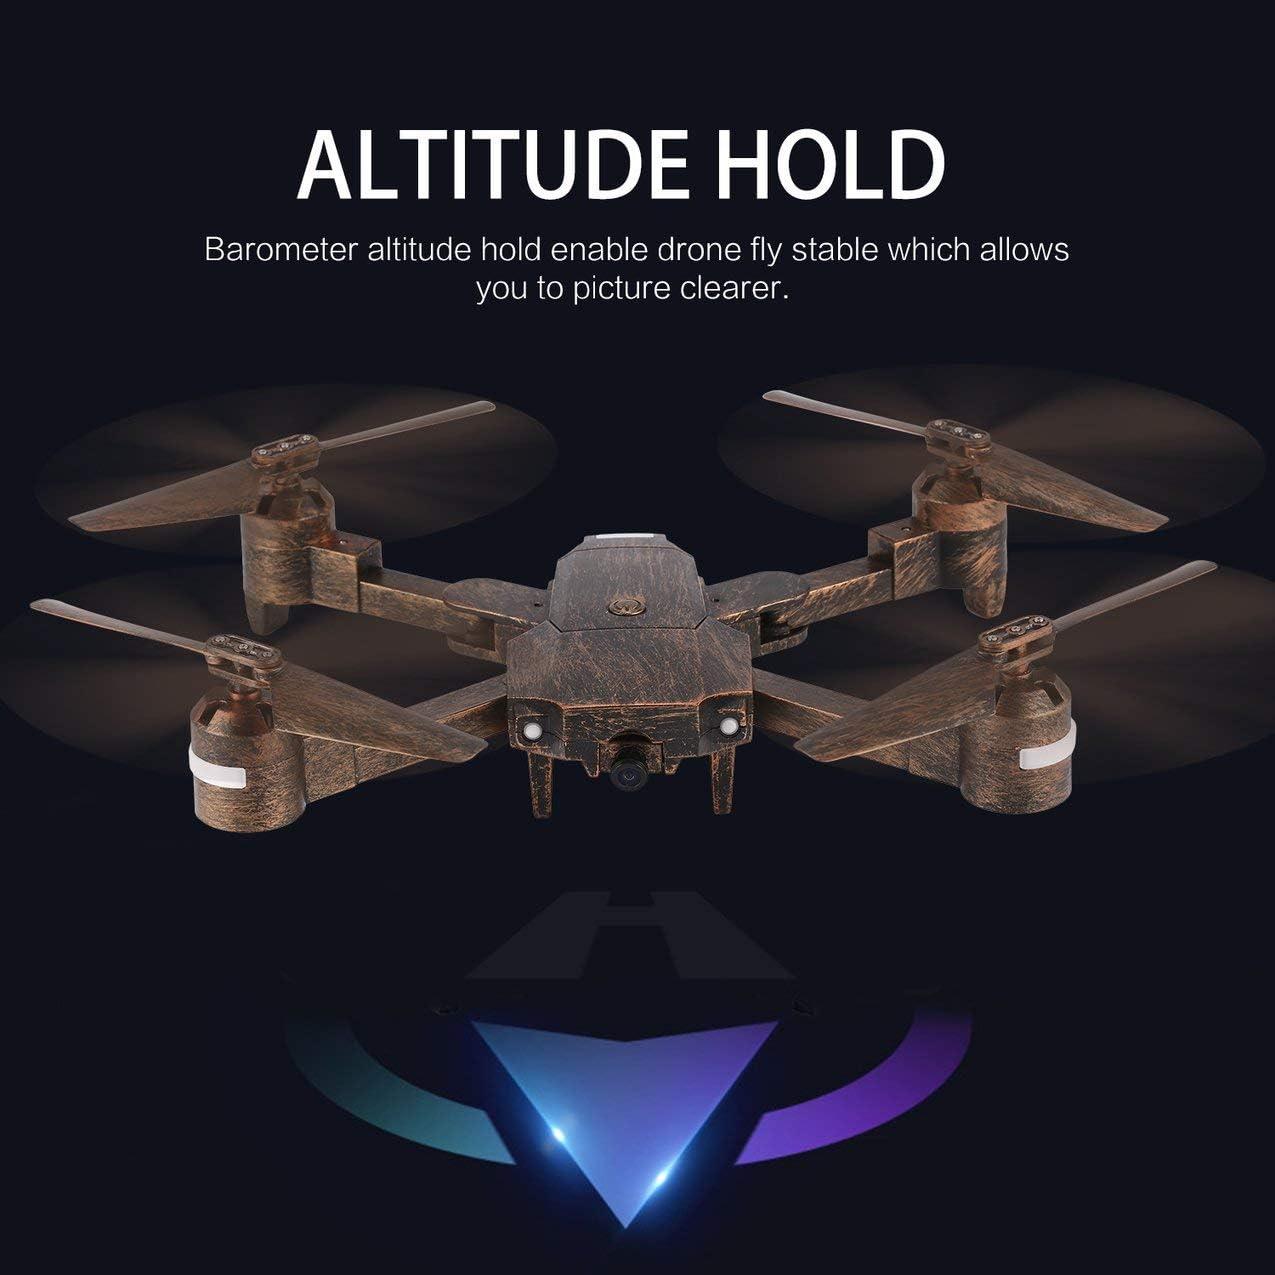 Redstrong Attop X-PACK1 2.4G Drone 720P HD WiFi Cámara Gran Angular Video en Vivo FPV RC Quadcopter Plegable con Altitude Hold Headless: Amazon.es: Juguetes y juegos